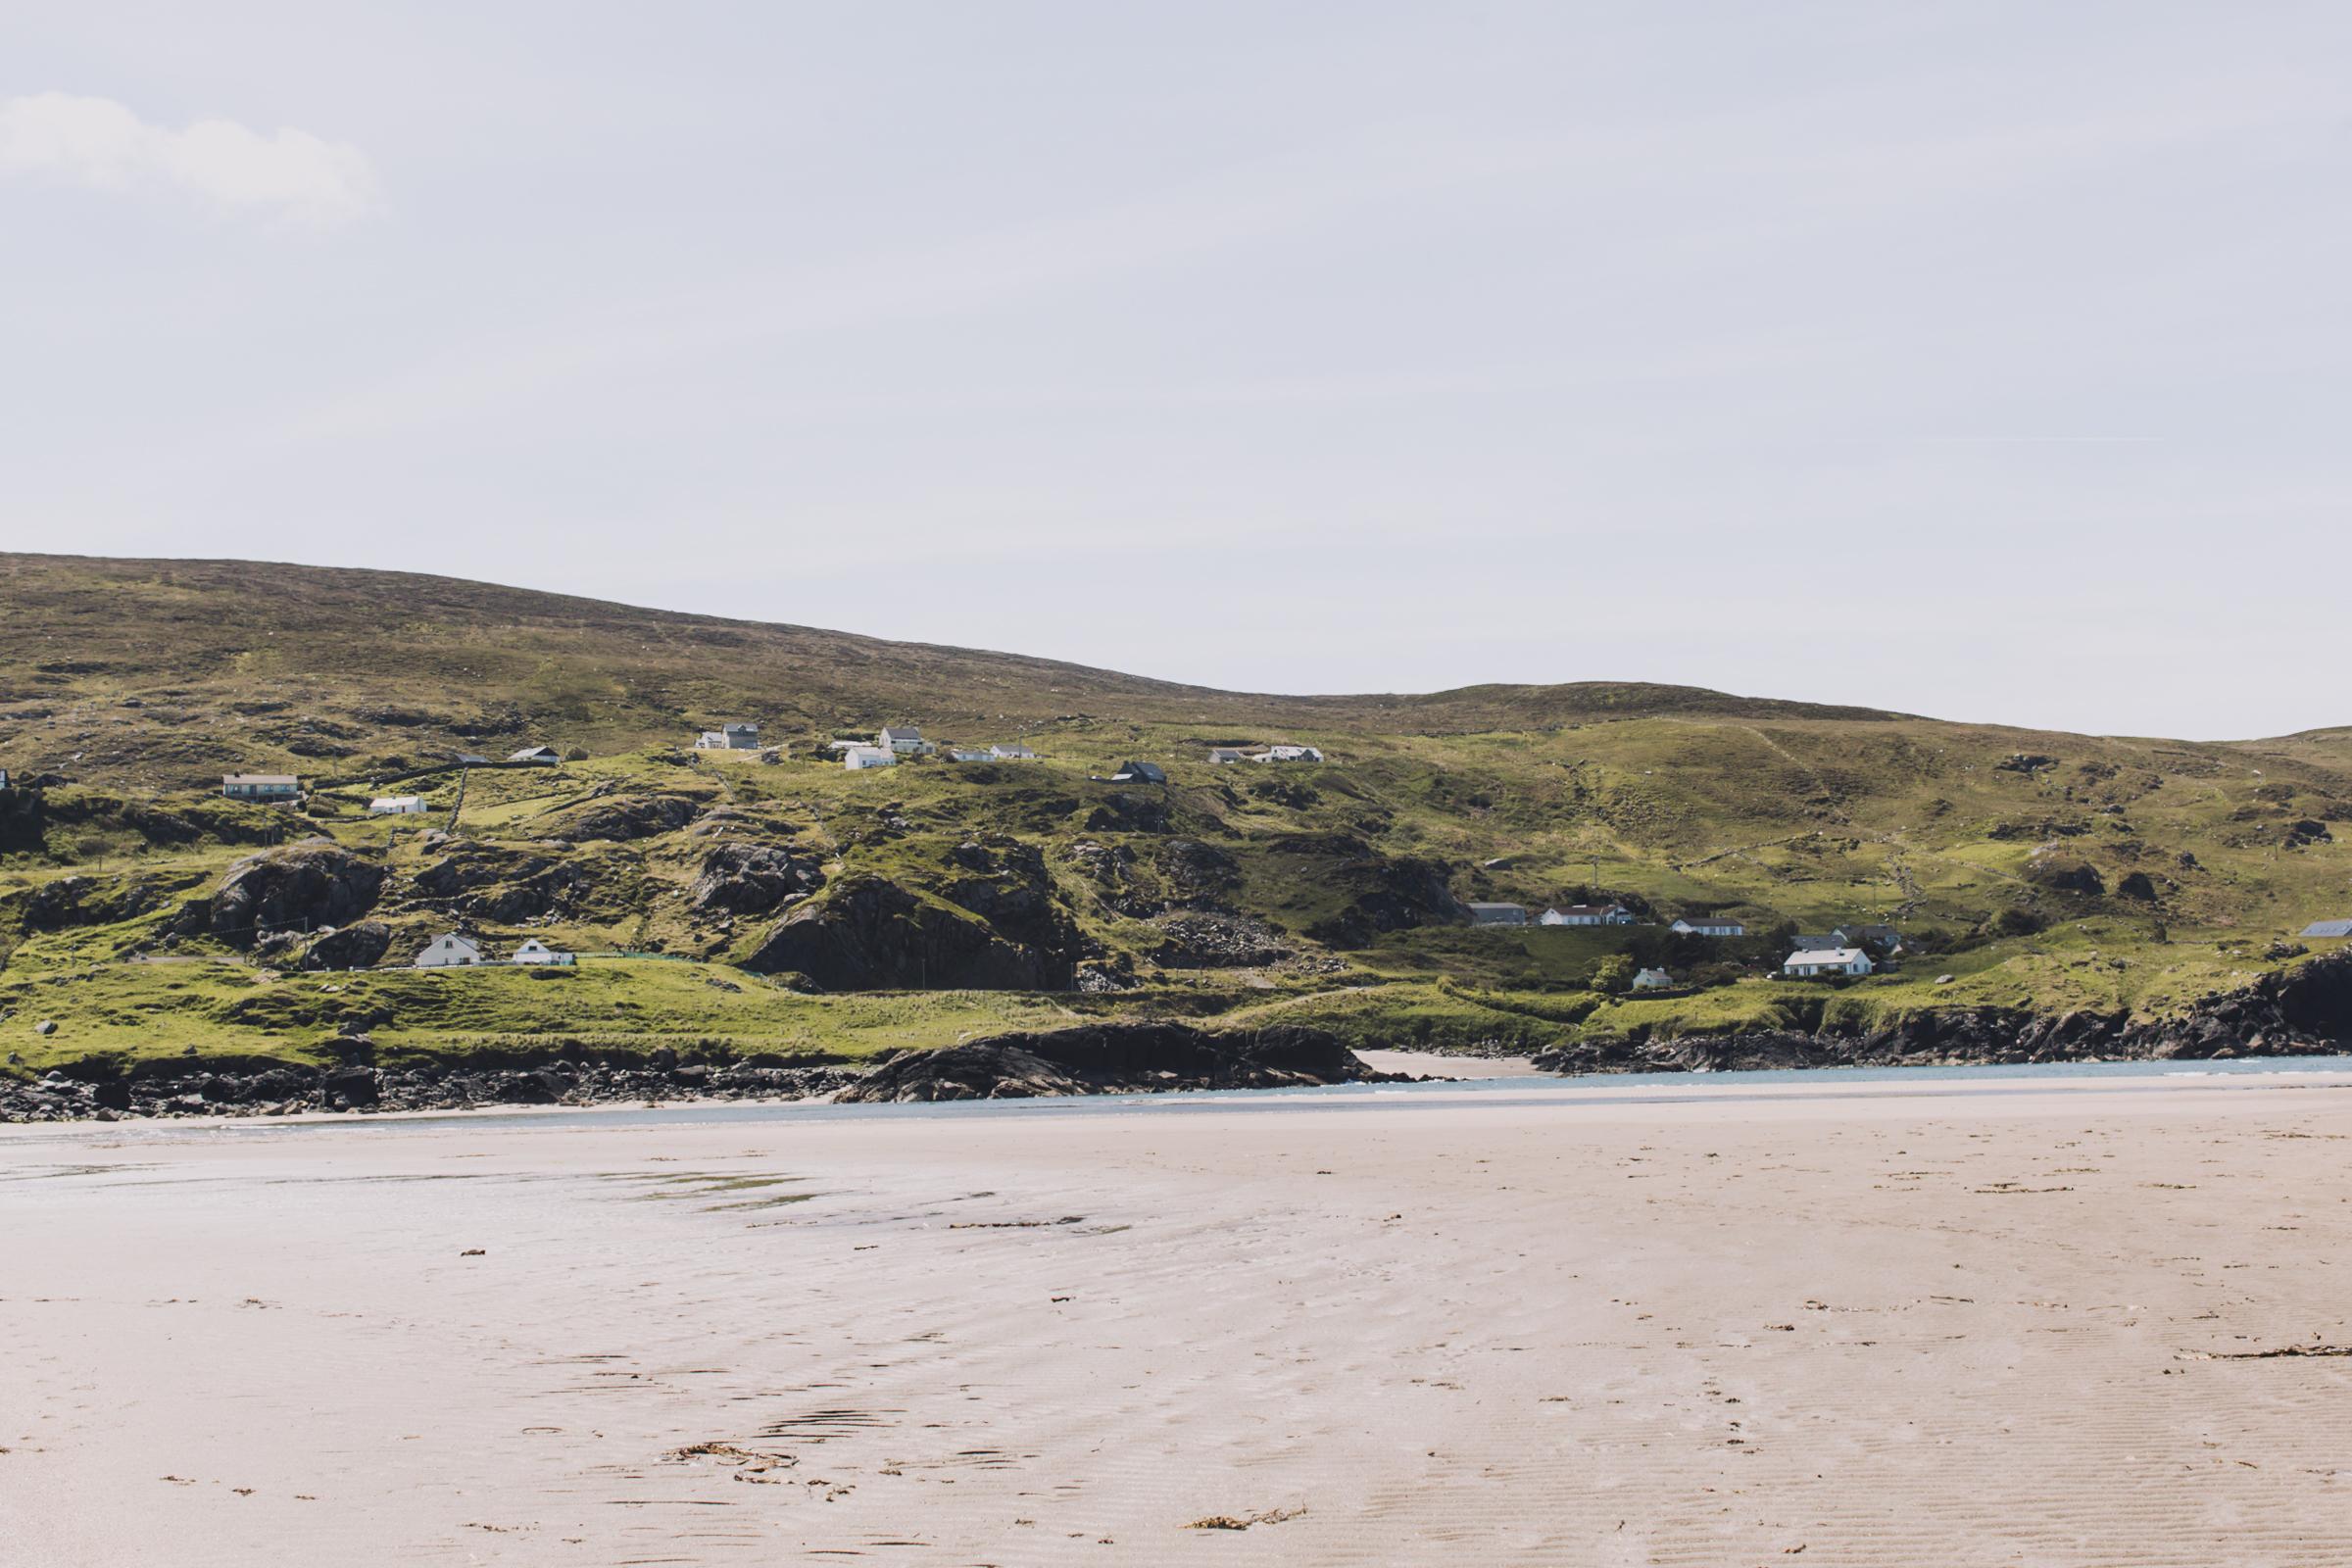 20150614-042-Ireland_Travel_Editorial.jpg